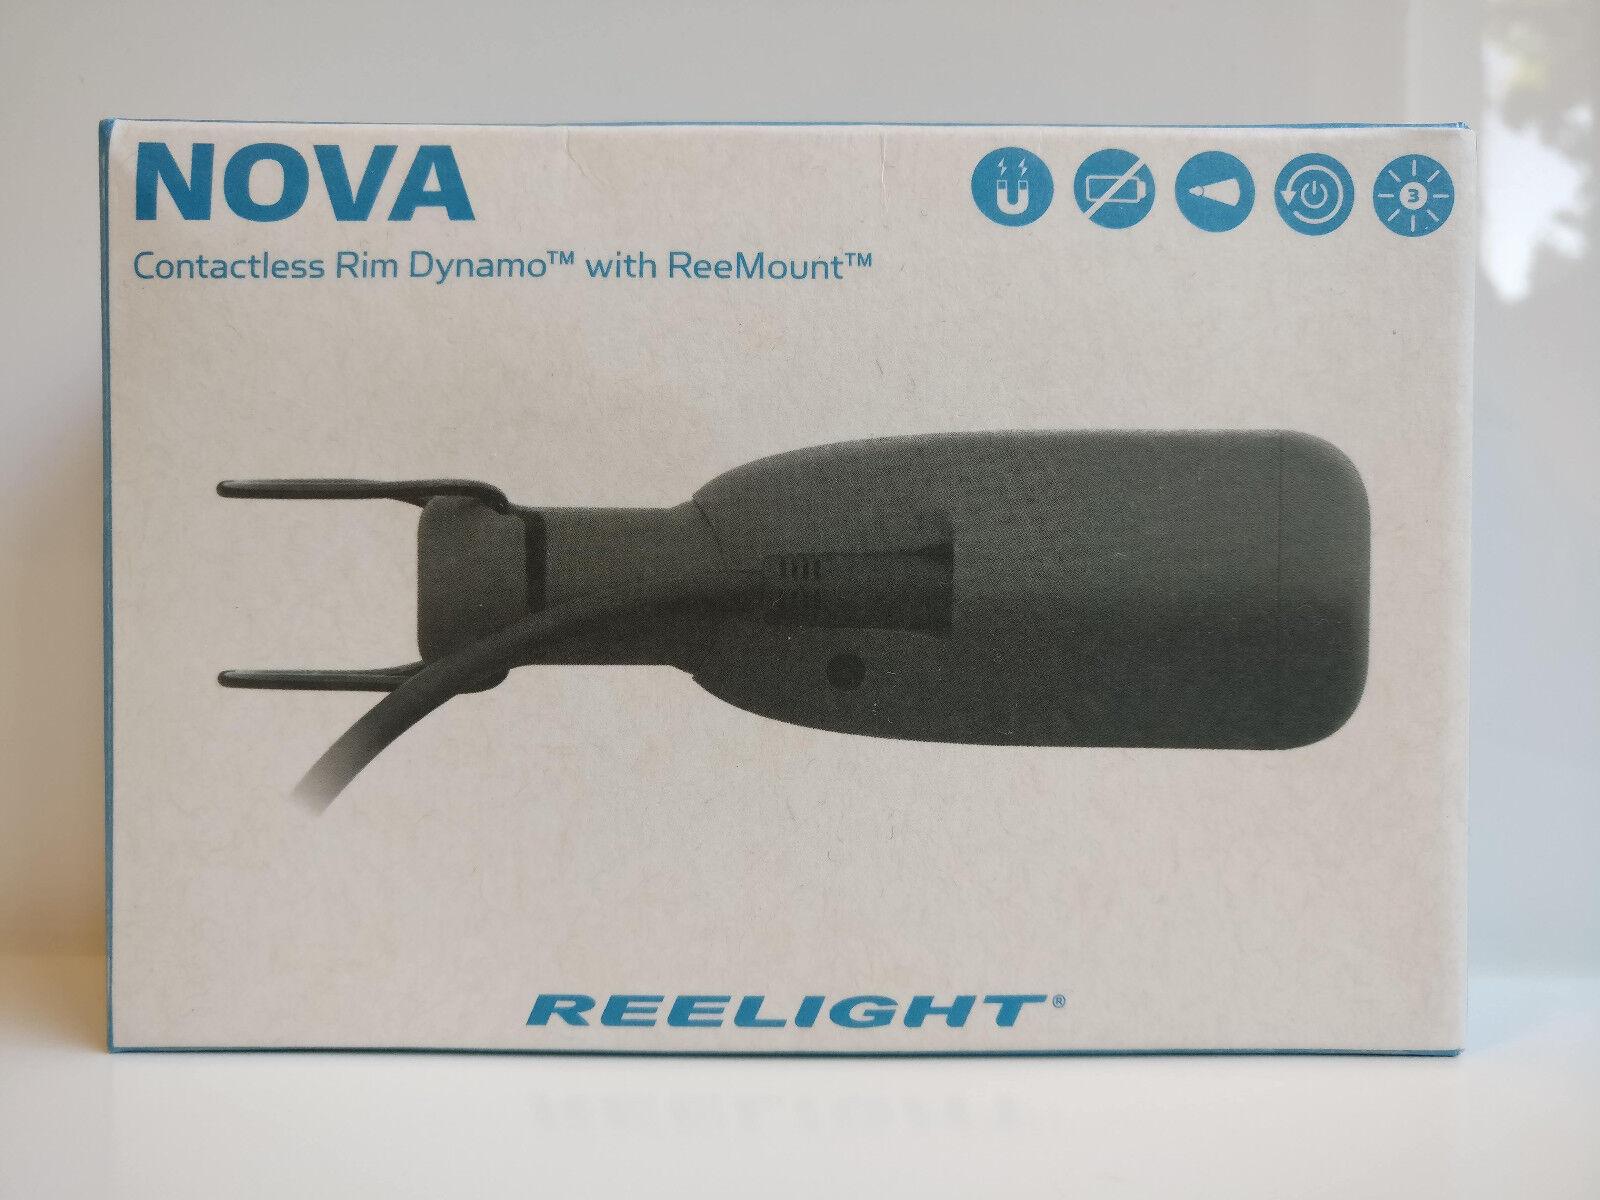 Reelight NOVA Contactless Rim Dynamo ReePower Modular for Bike Bicycle Cycling